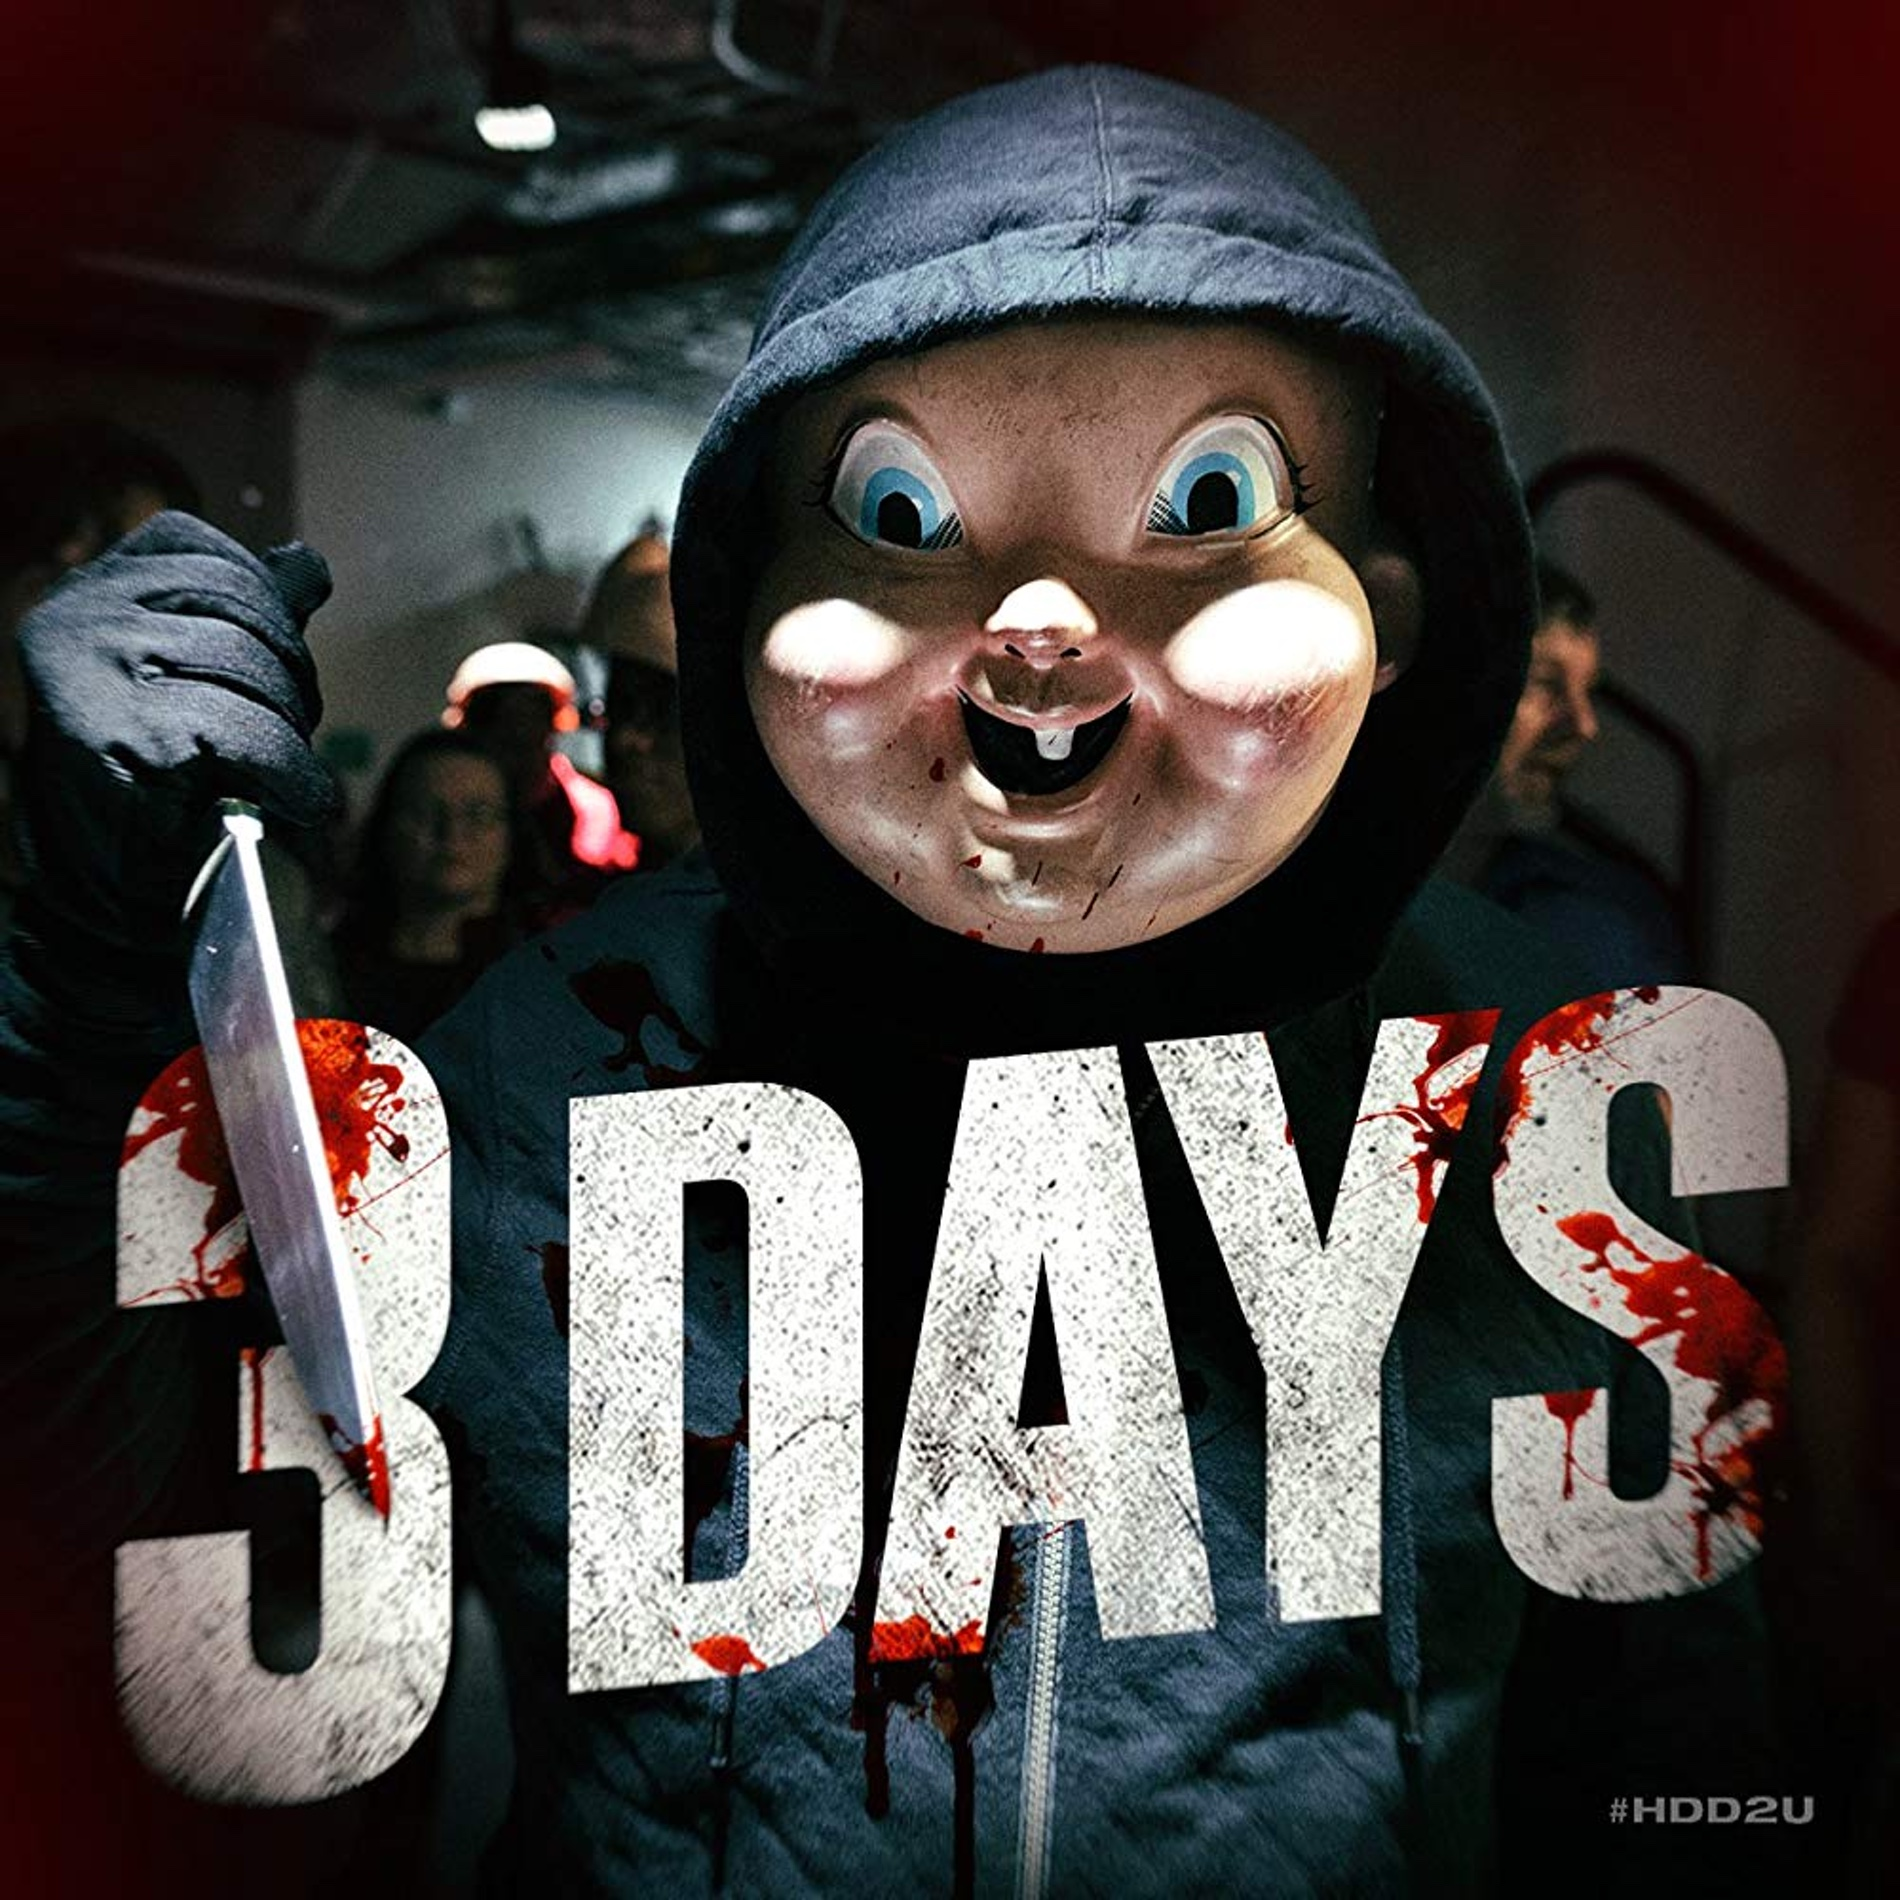 Movie Trend Happy Death Day 2u This Year @KoolGadgetz.com